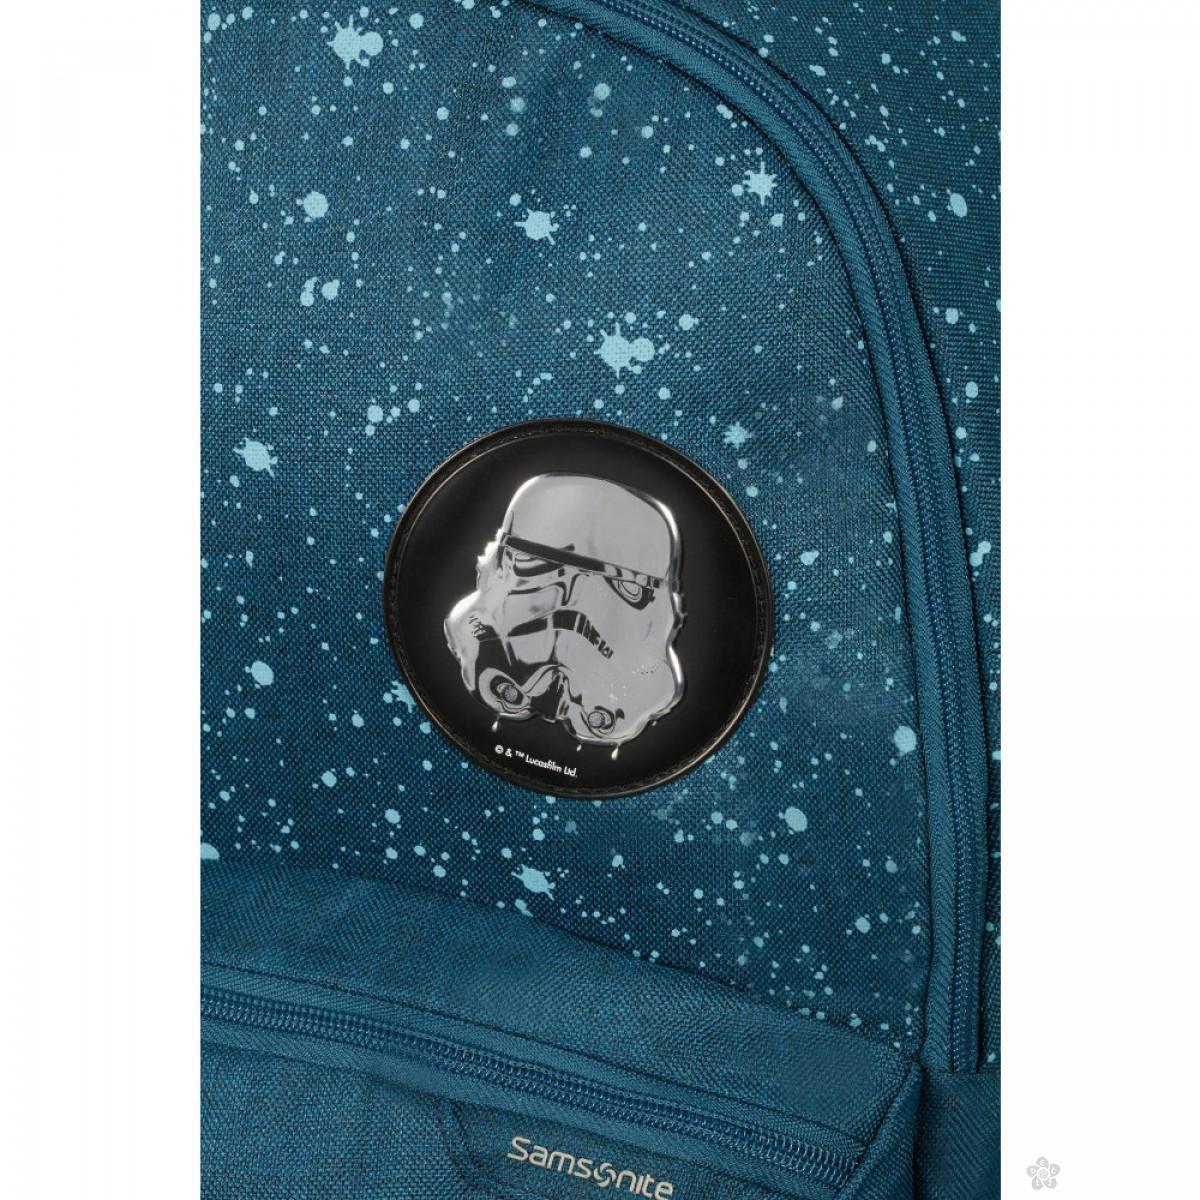 Samsonite ranac na točkiće Star Wars Intergalactic 51C*11001